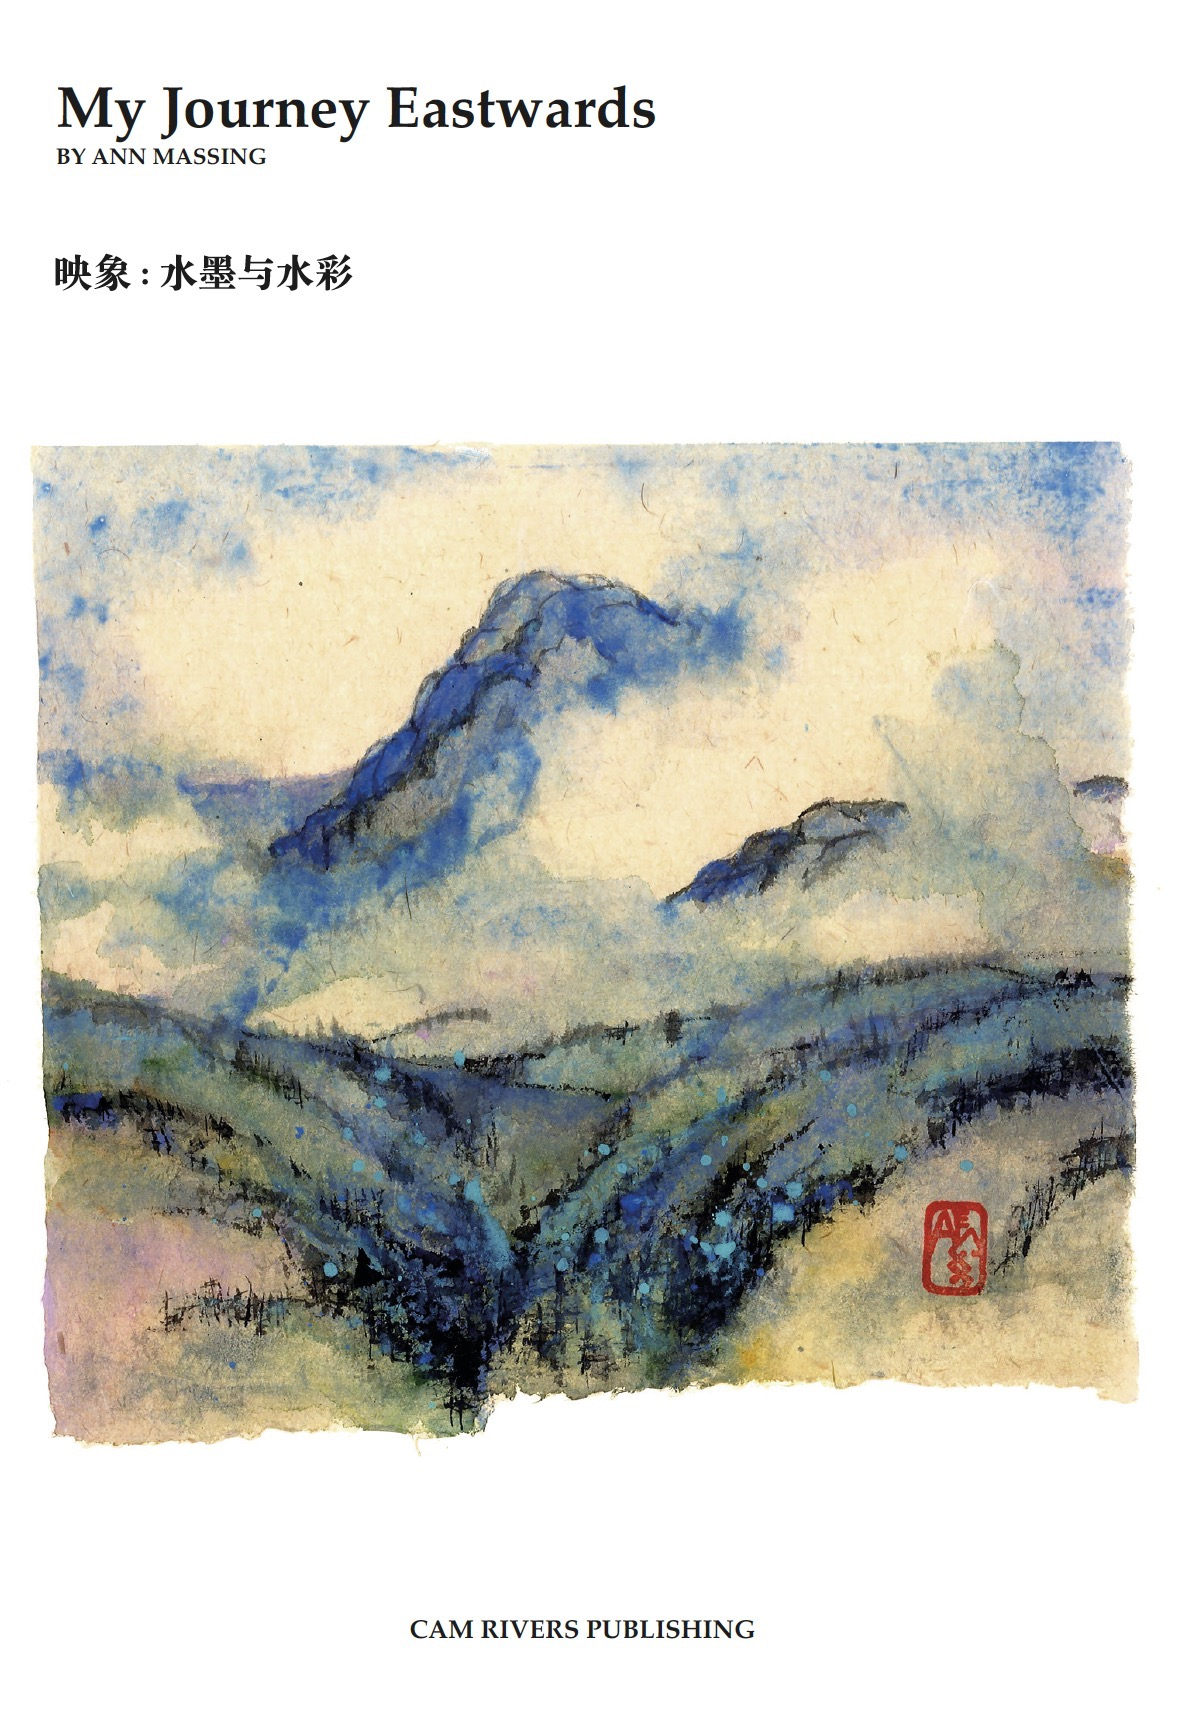 Ann Massing book cover.jpeg